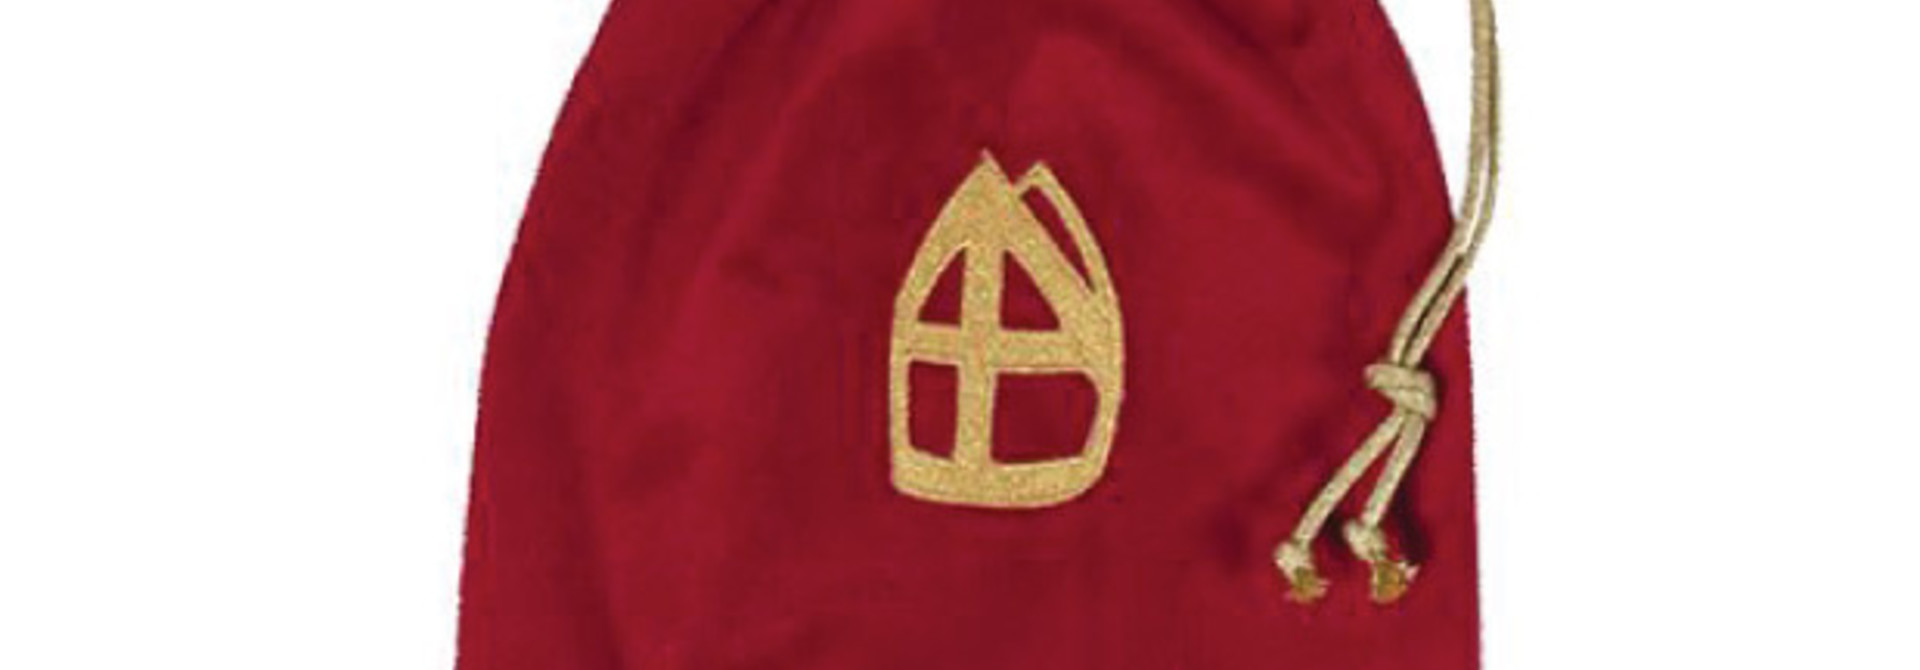 Strooizak luxe  fluweel rood